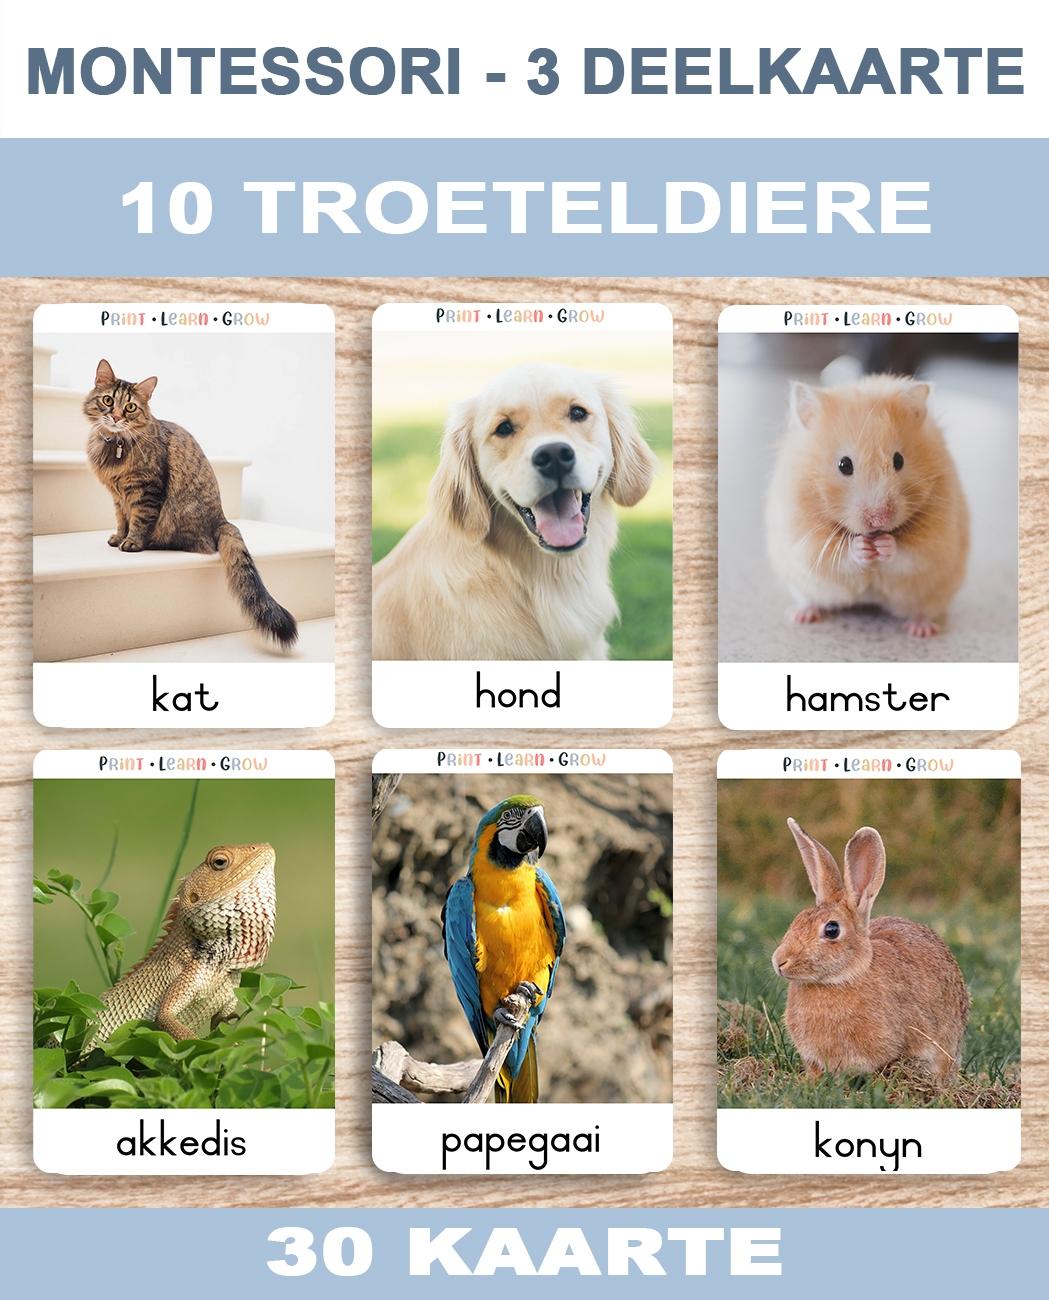 0. Troeteldiere – Cover – TemplateA